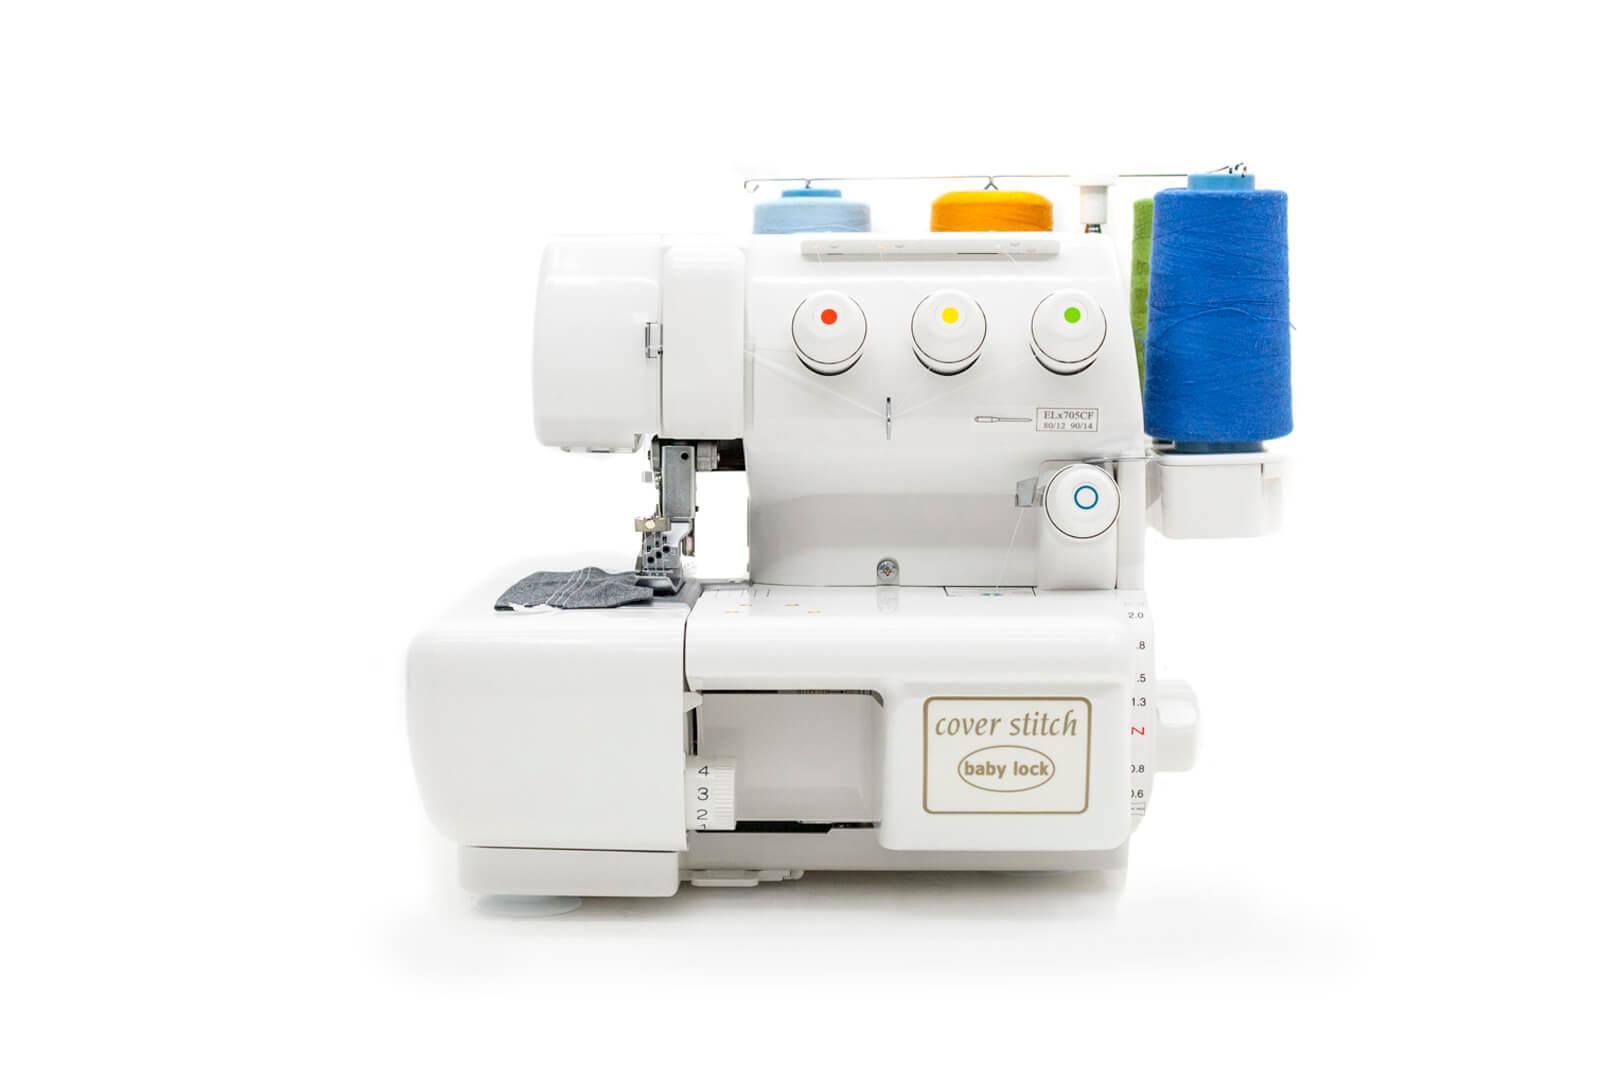 baby locks newest machine - HD1620×1080